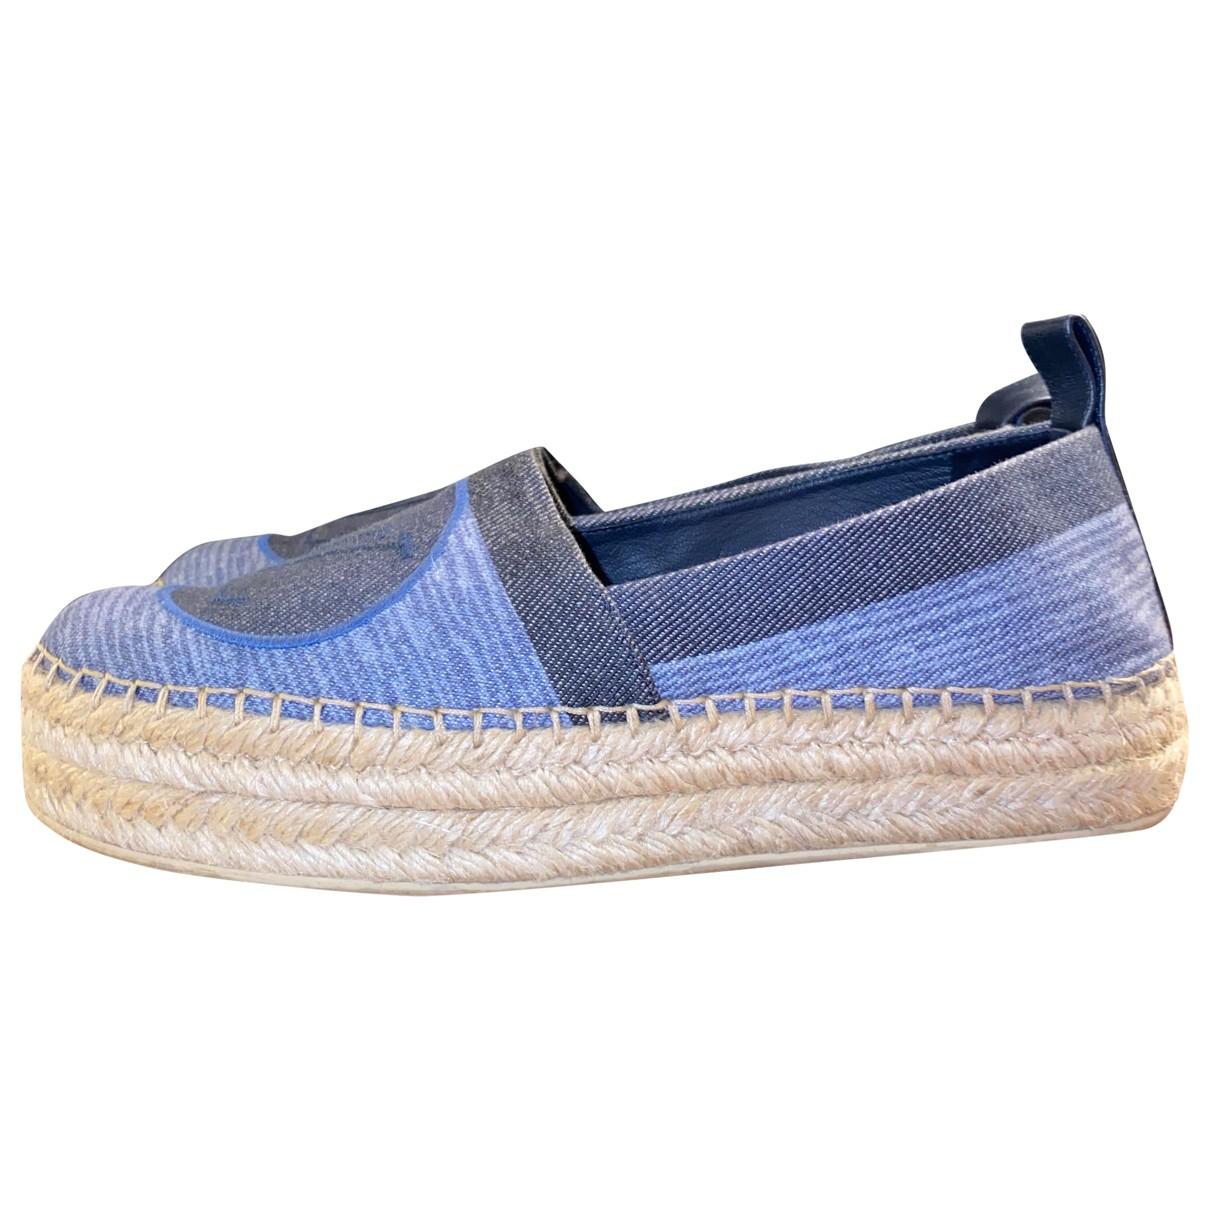 Louis Vuitton Seashore Espadrilles in  Blau Denim - Jeans